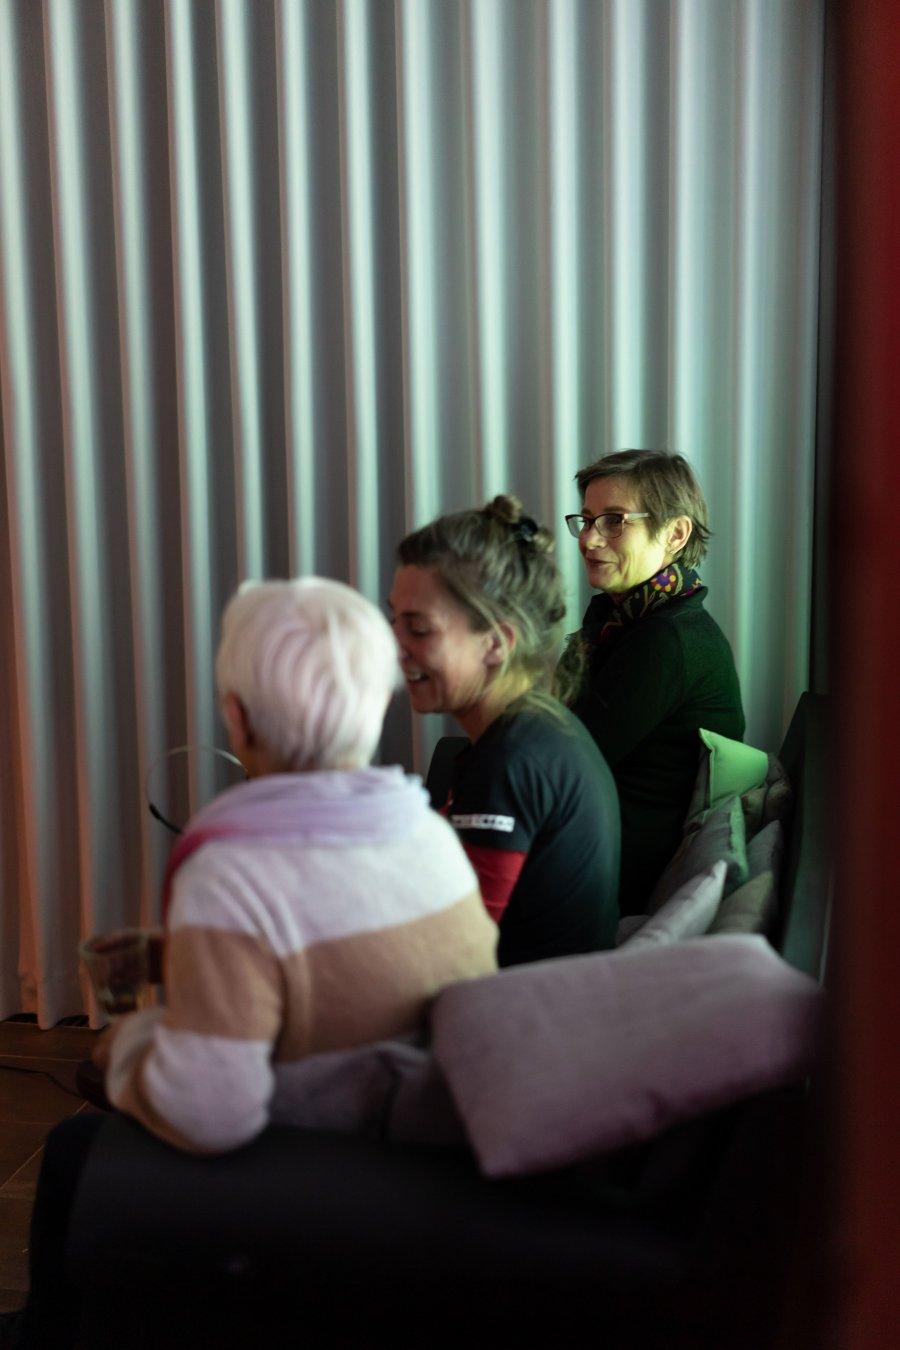 sofa68_Vernissage4_Seppo-Gründler_@_esc_medien-kunst-labor_©_Foto:_Lara-Baumgartner